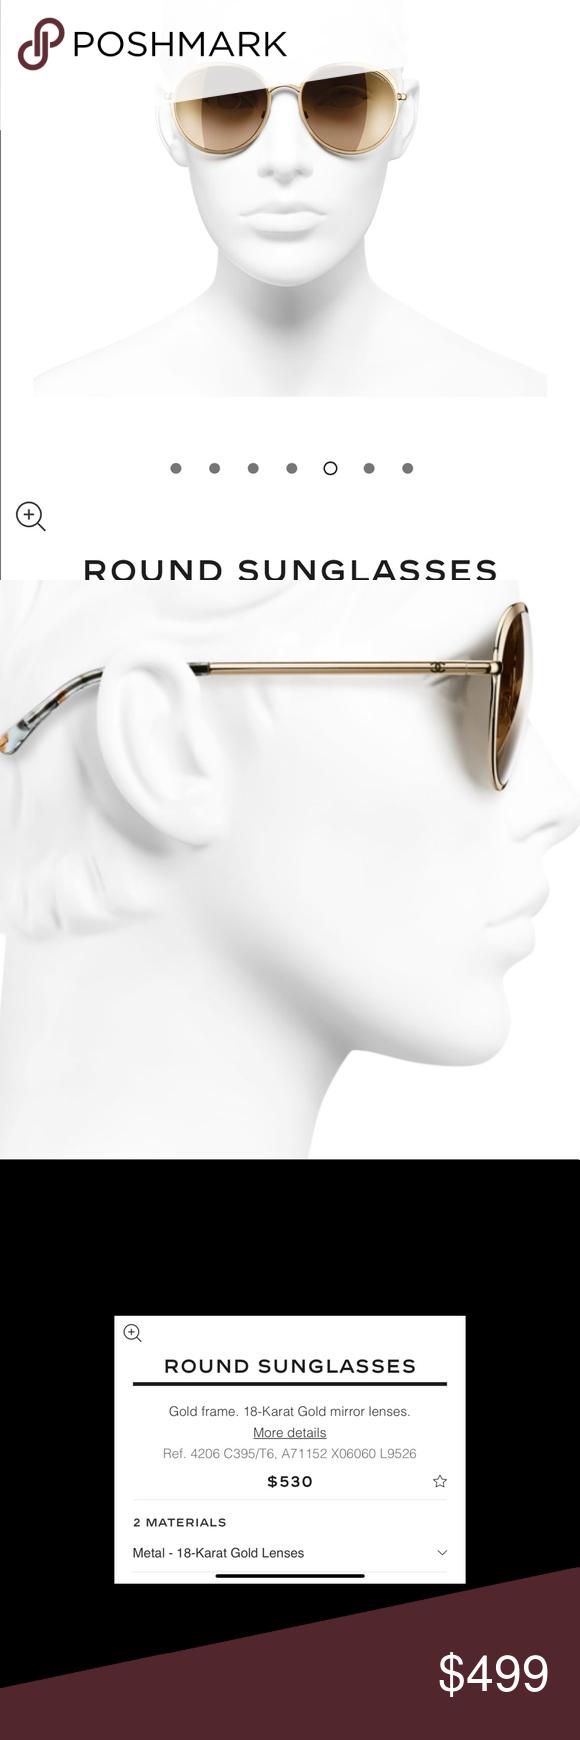 1318585e1c Chanel 4206 18kt gold sunglasses 🕶 Brand new   🔥🔥🔥- mirrored and fabulous  CHANEL Accessories Sunglasses